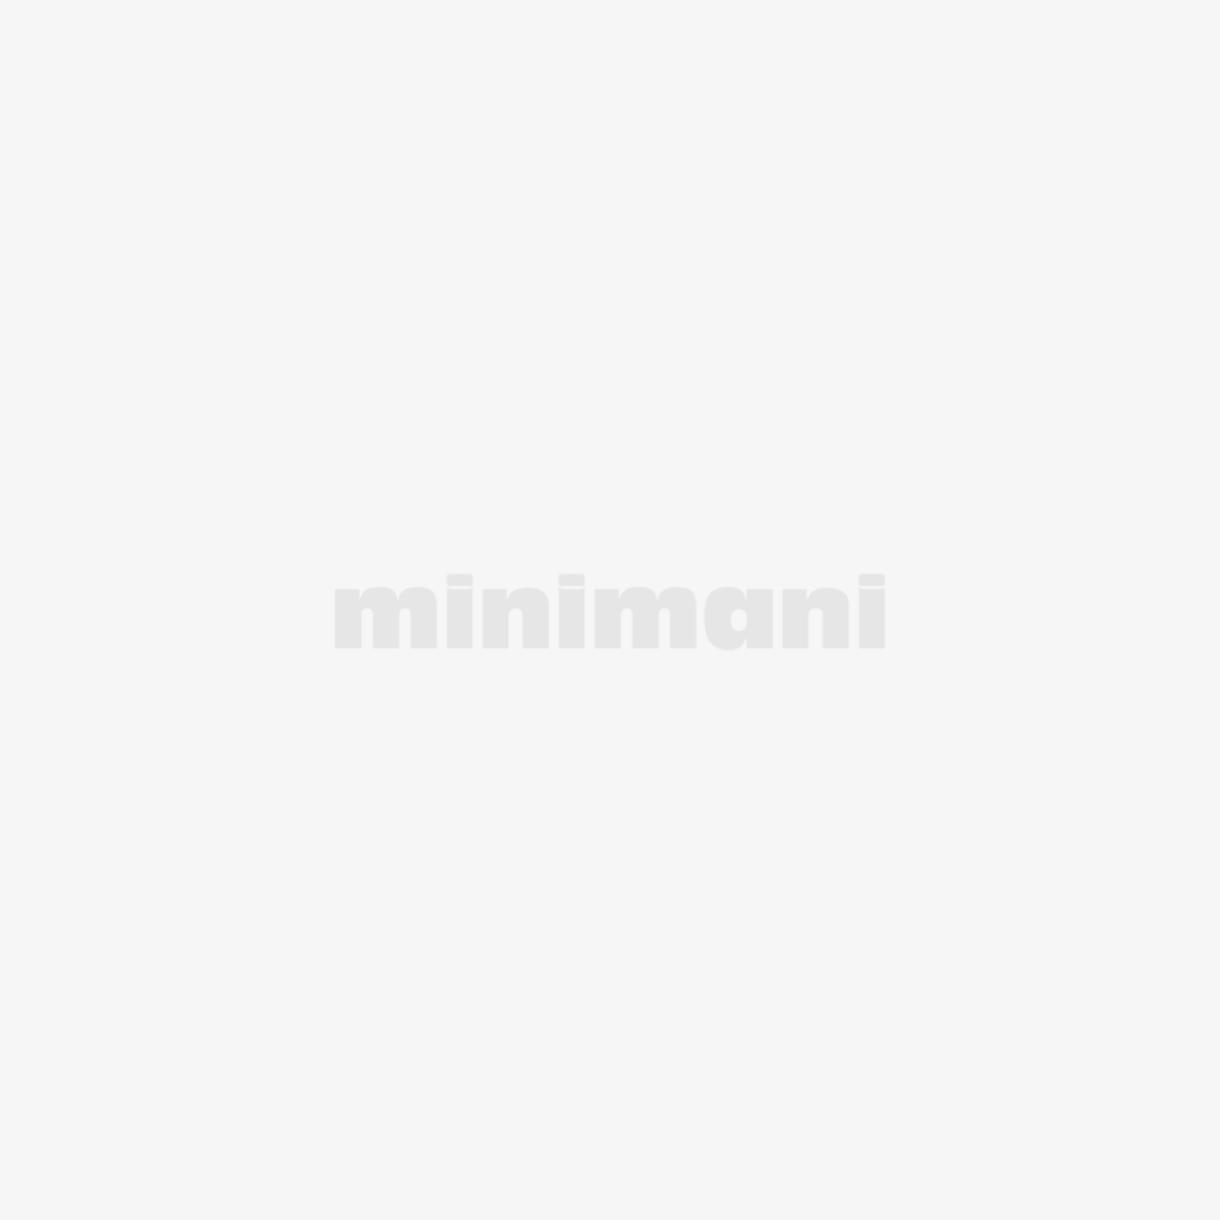 Mustang kohennusrauta 69cm, teräs